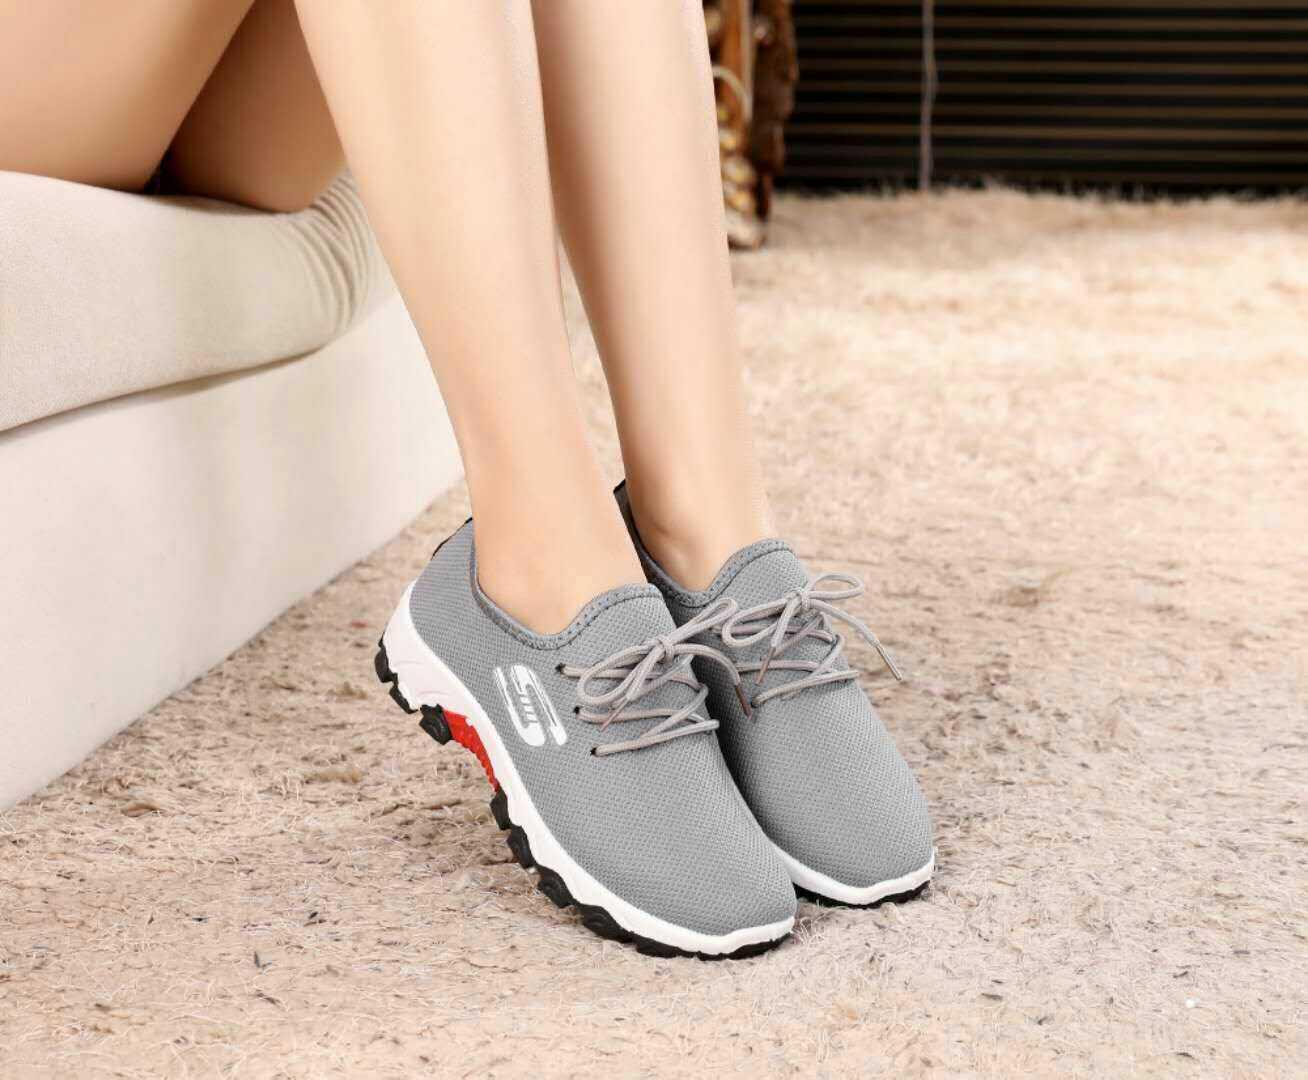 Cod Atest Non-Slip High-End Korean Sports Shoes - International By 5stars.ph